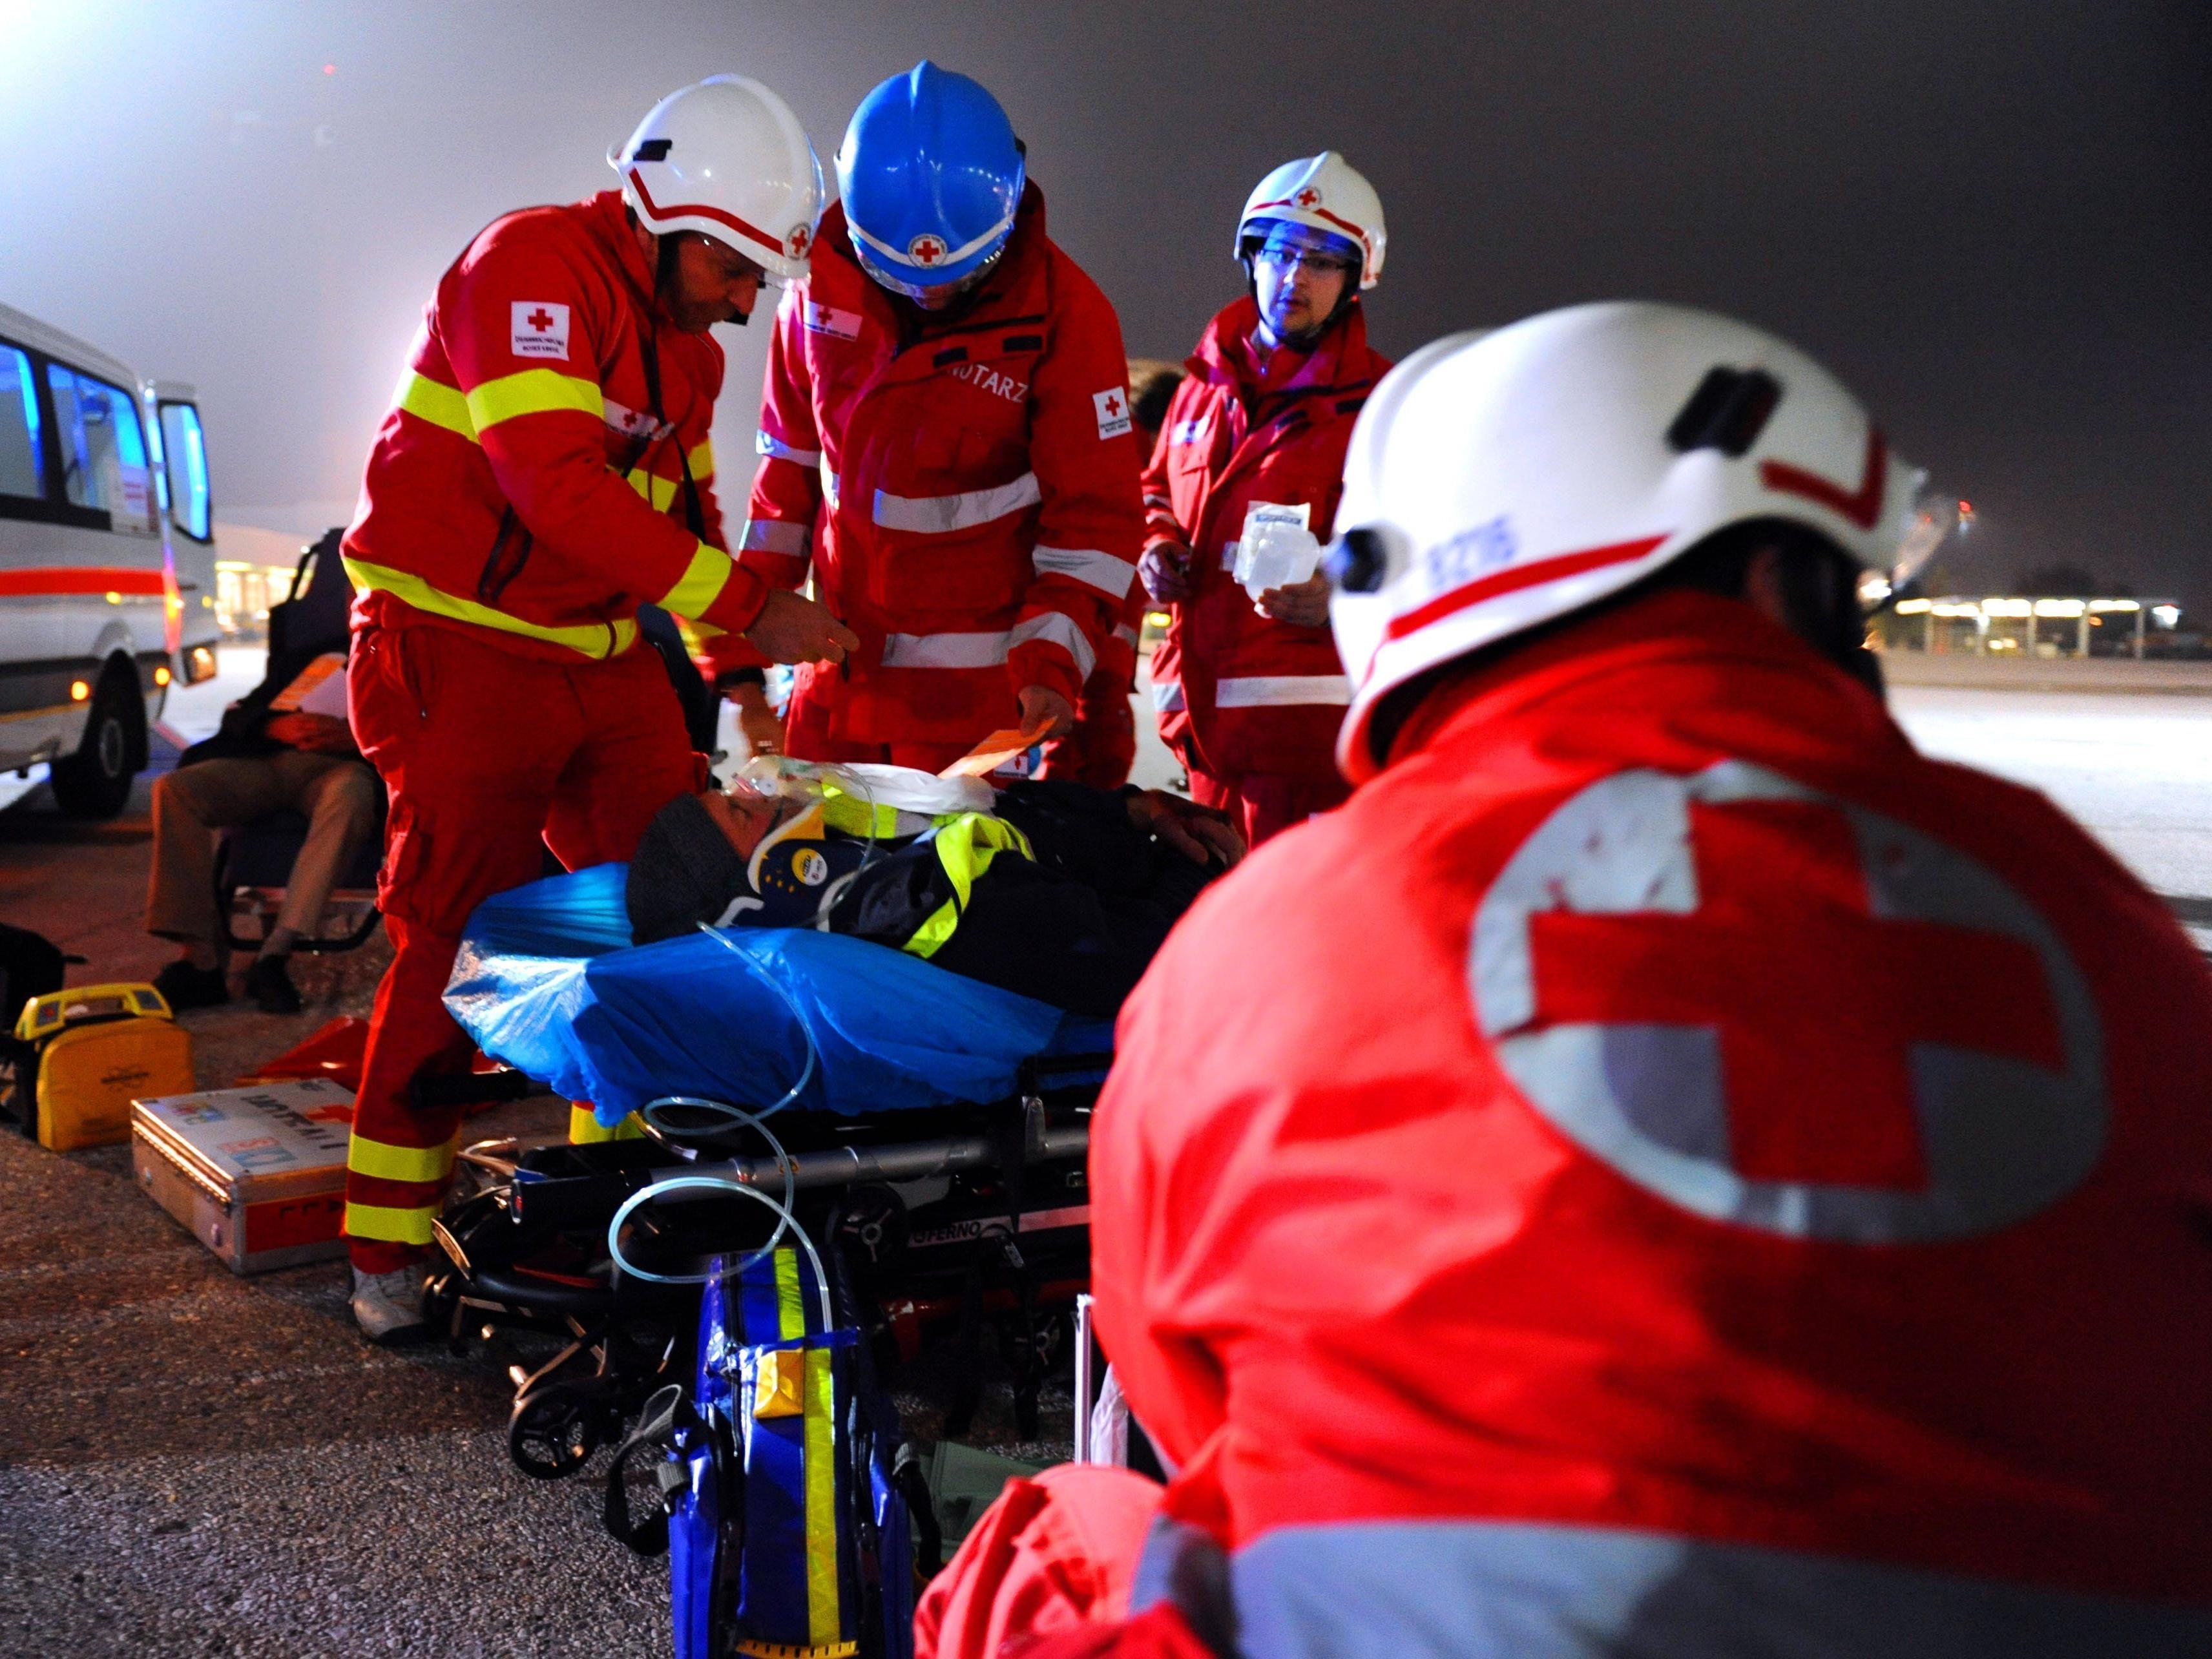 Das Rote Kreuz konnte den verunglückten Mann retten.